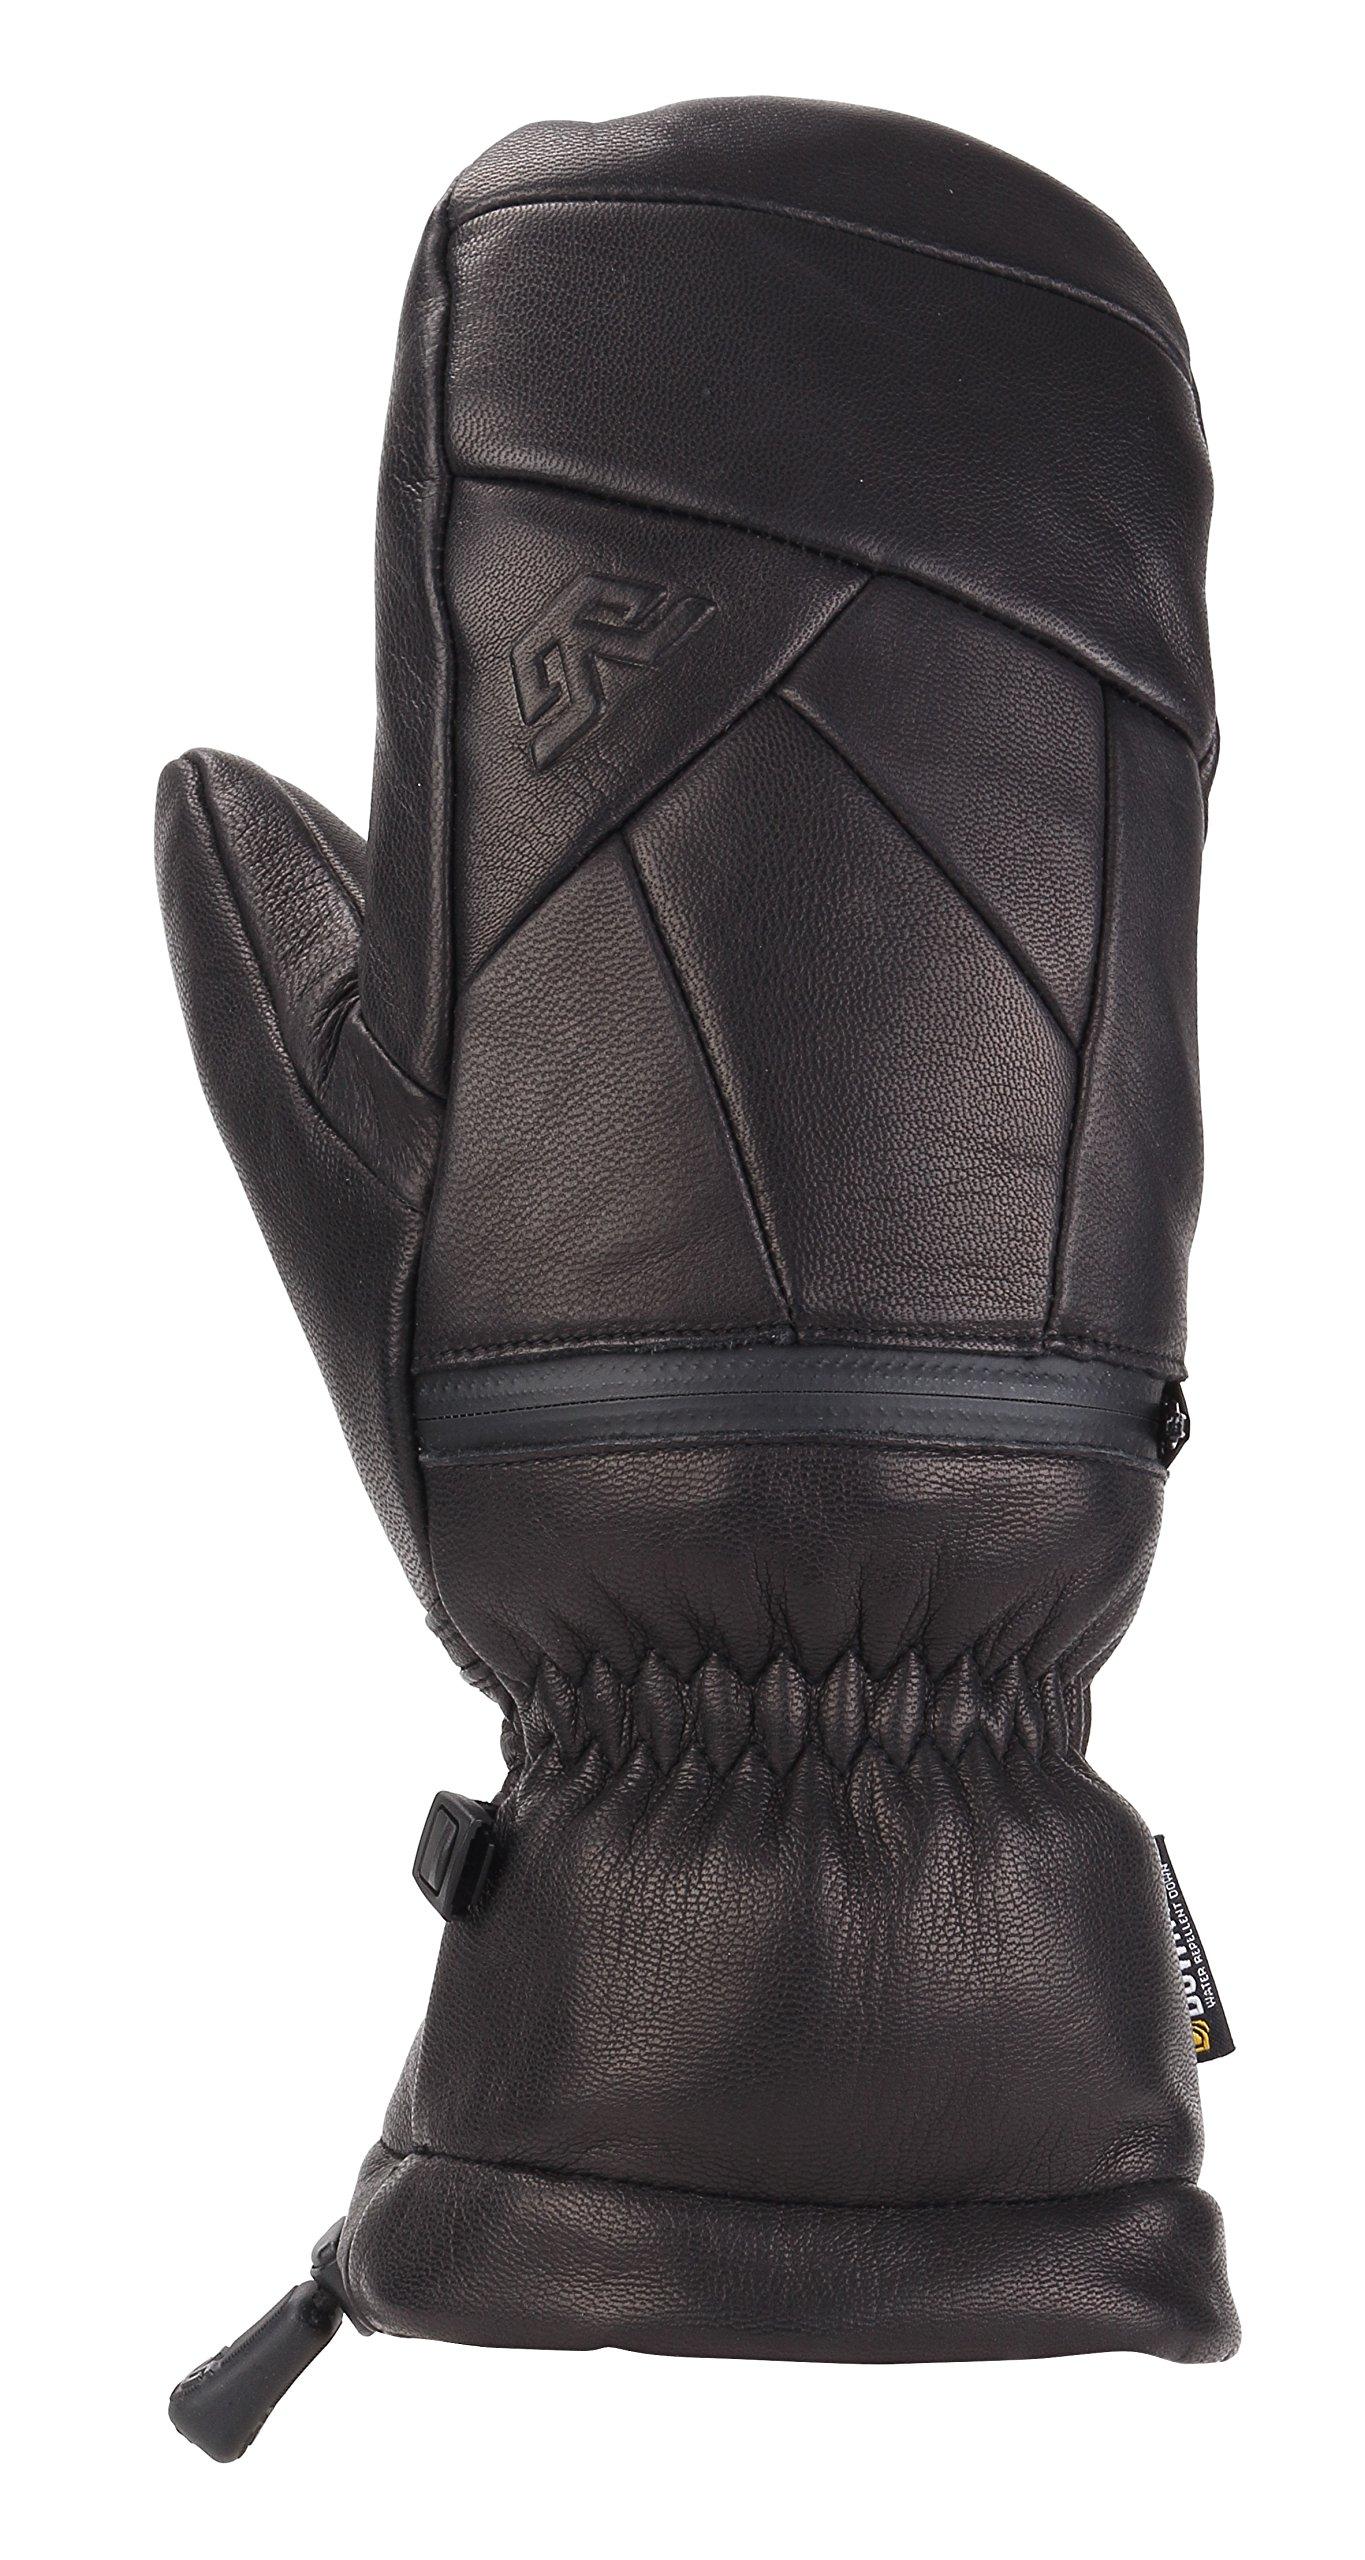 Gordini Women's Women's Leather Goose Iv Insulated Mittens, Black, Medium by Gordini